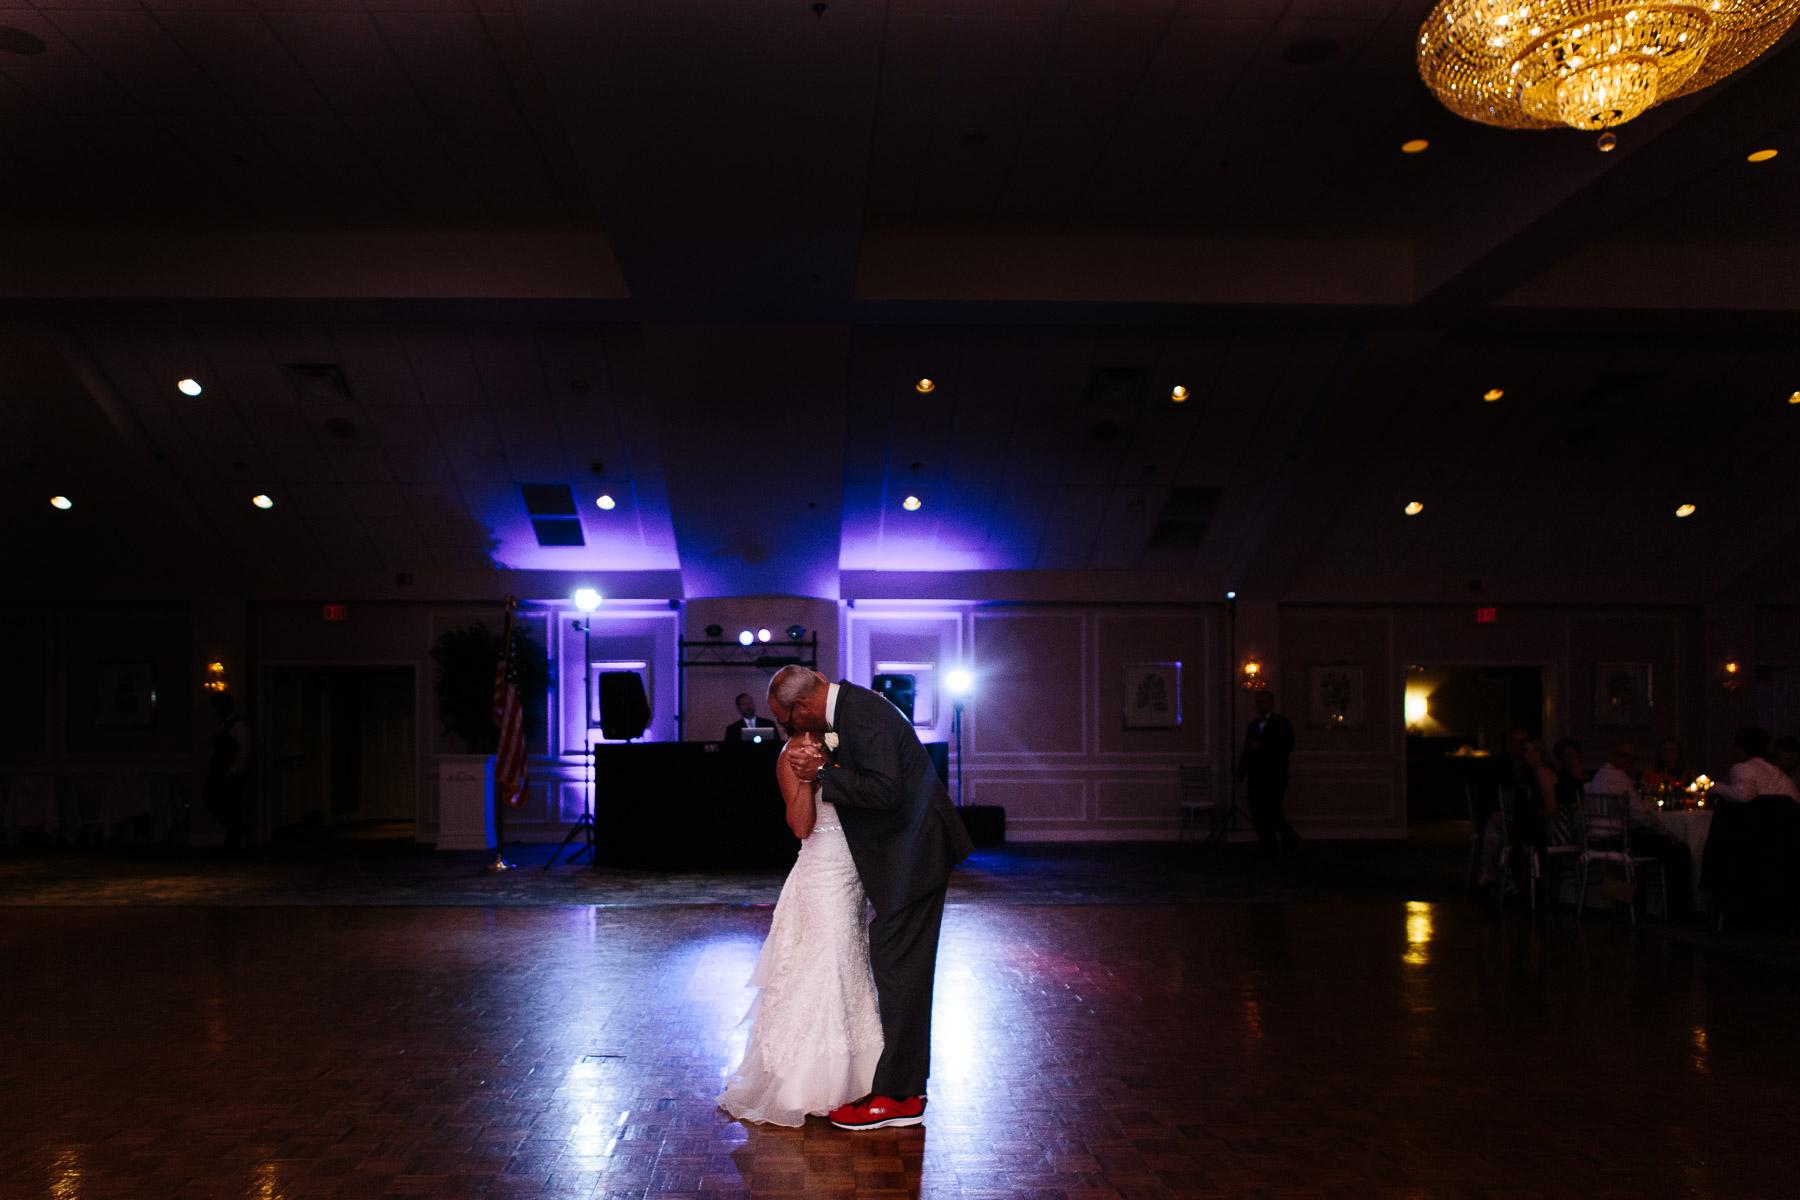 springfield-country-club-wedding-photo-65.jpg